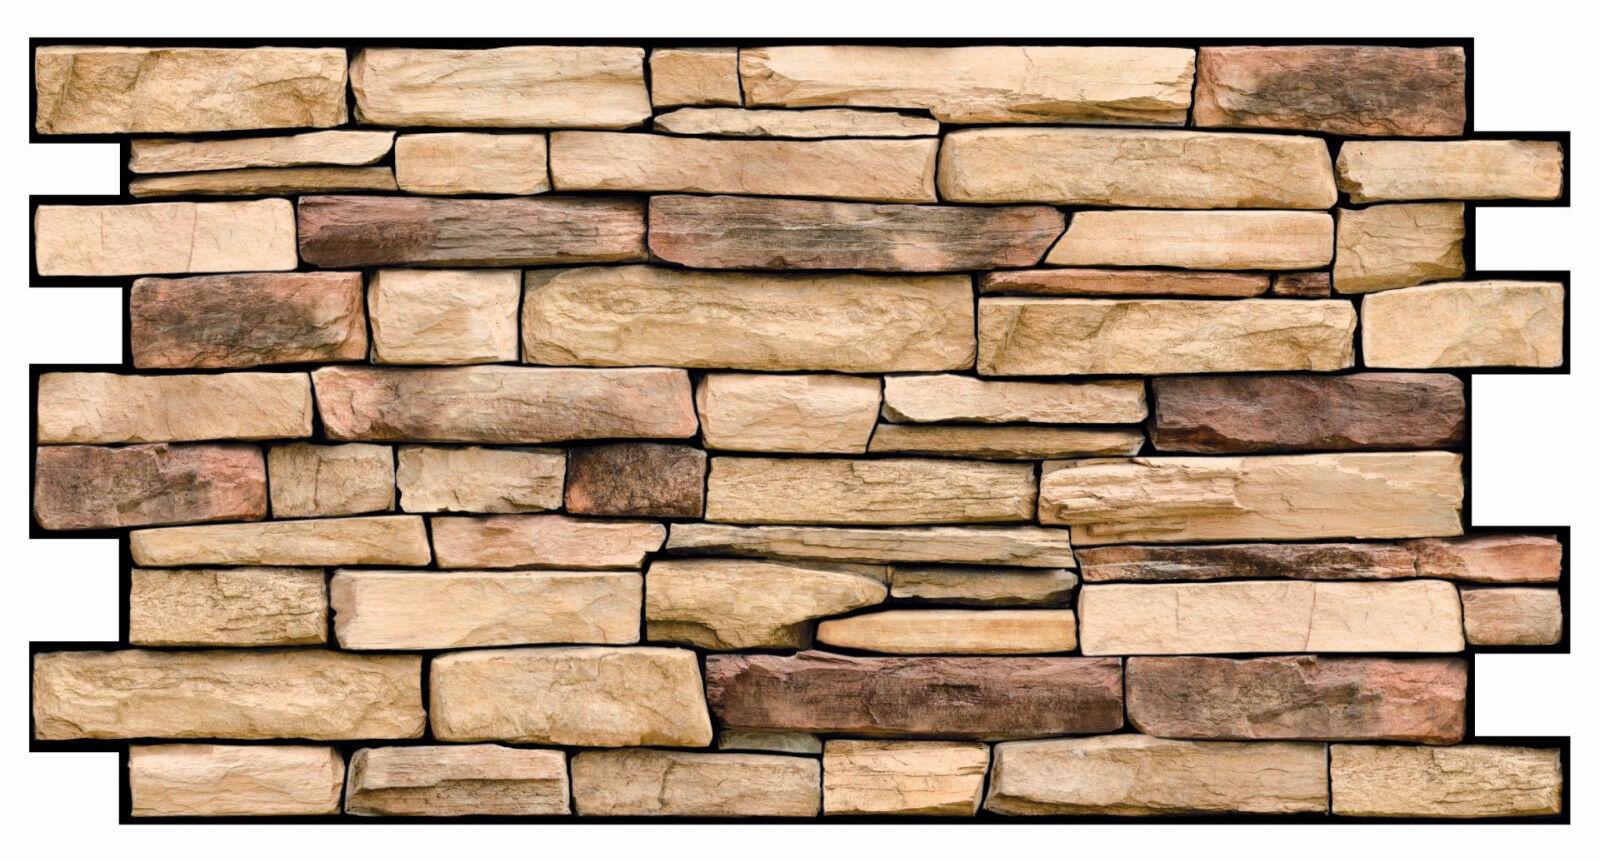 PVC Plastic Wall Panels 3D Decorative Tiles Cladding - NATURAL STONE SLATE